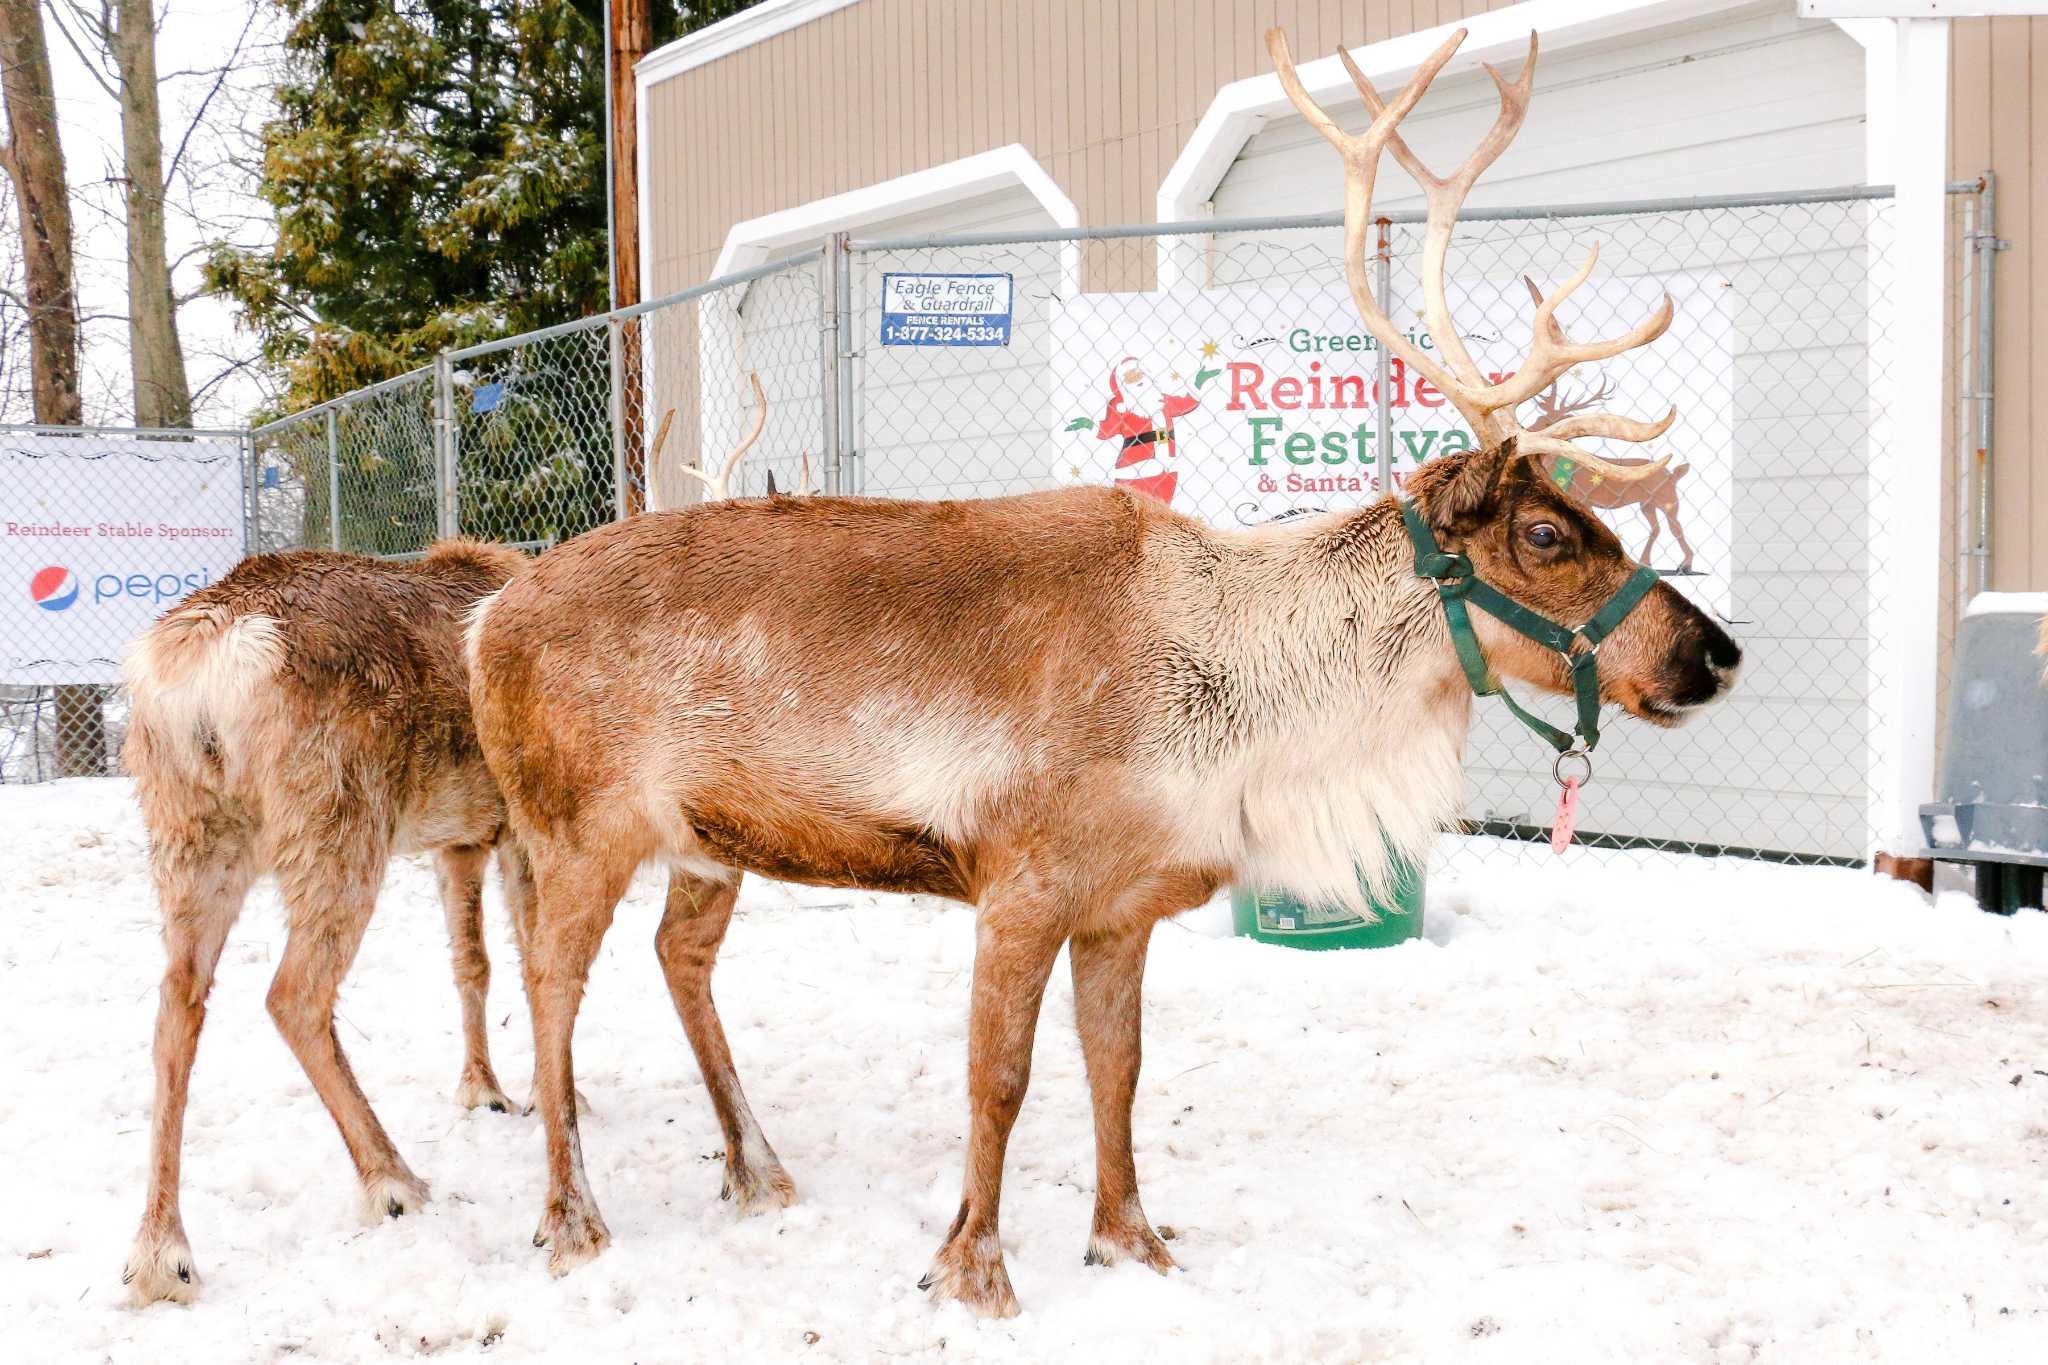 Reindeer Festival, Santa's Village set up shop in ... Reindeer Niche